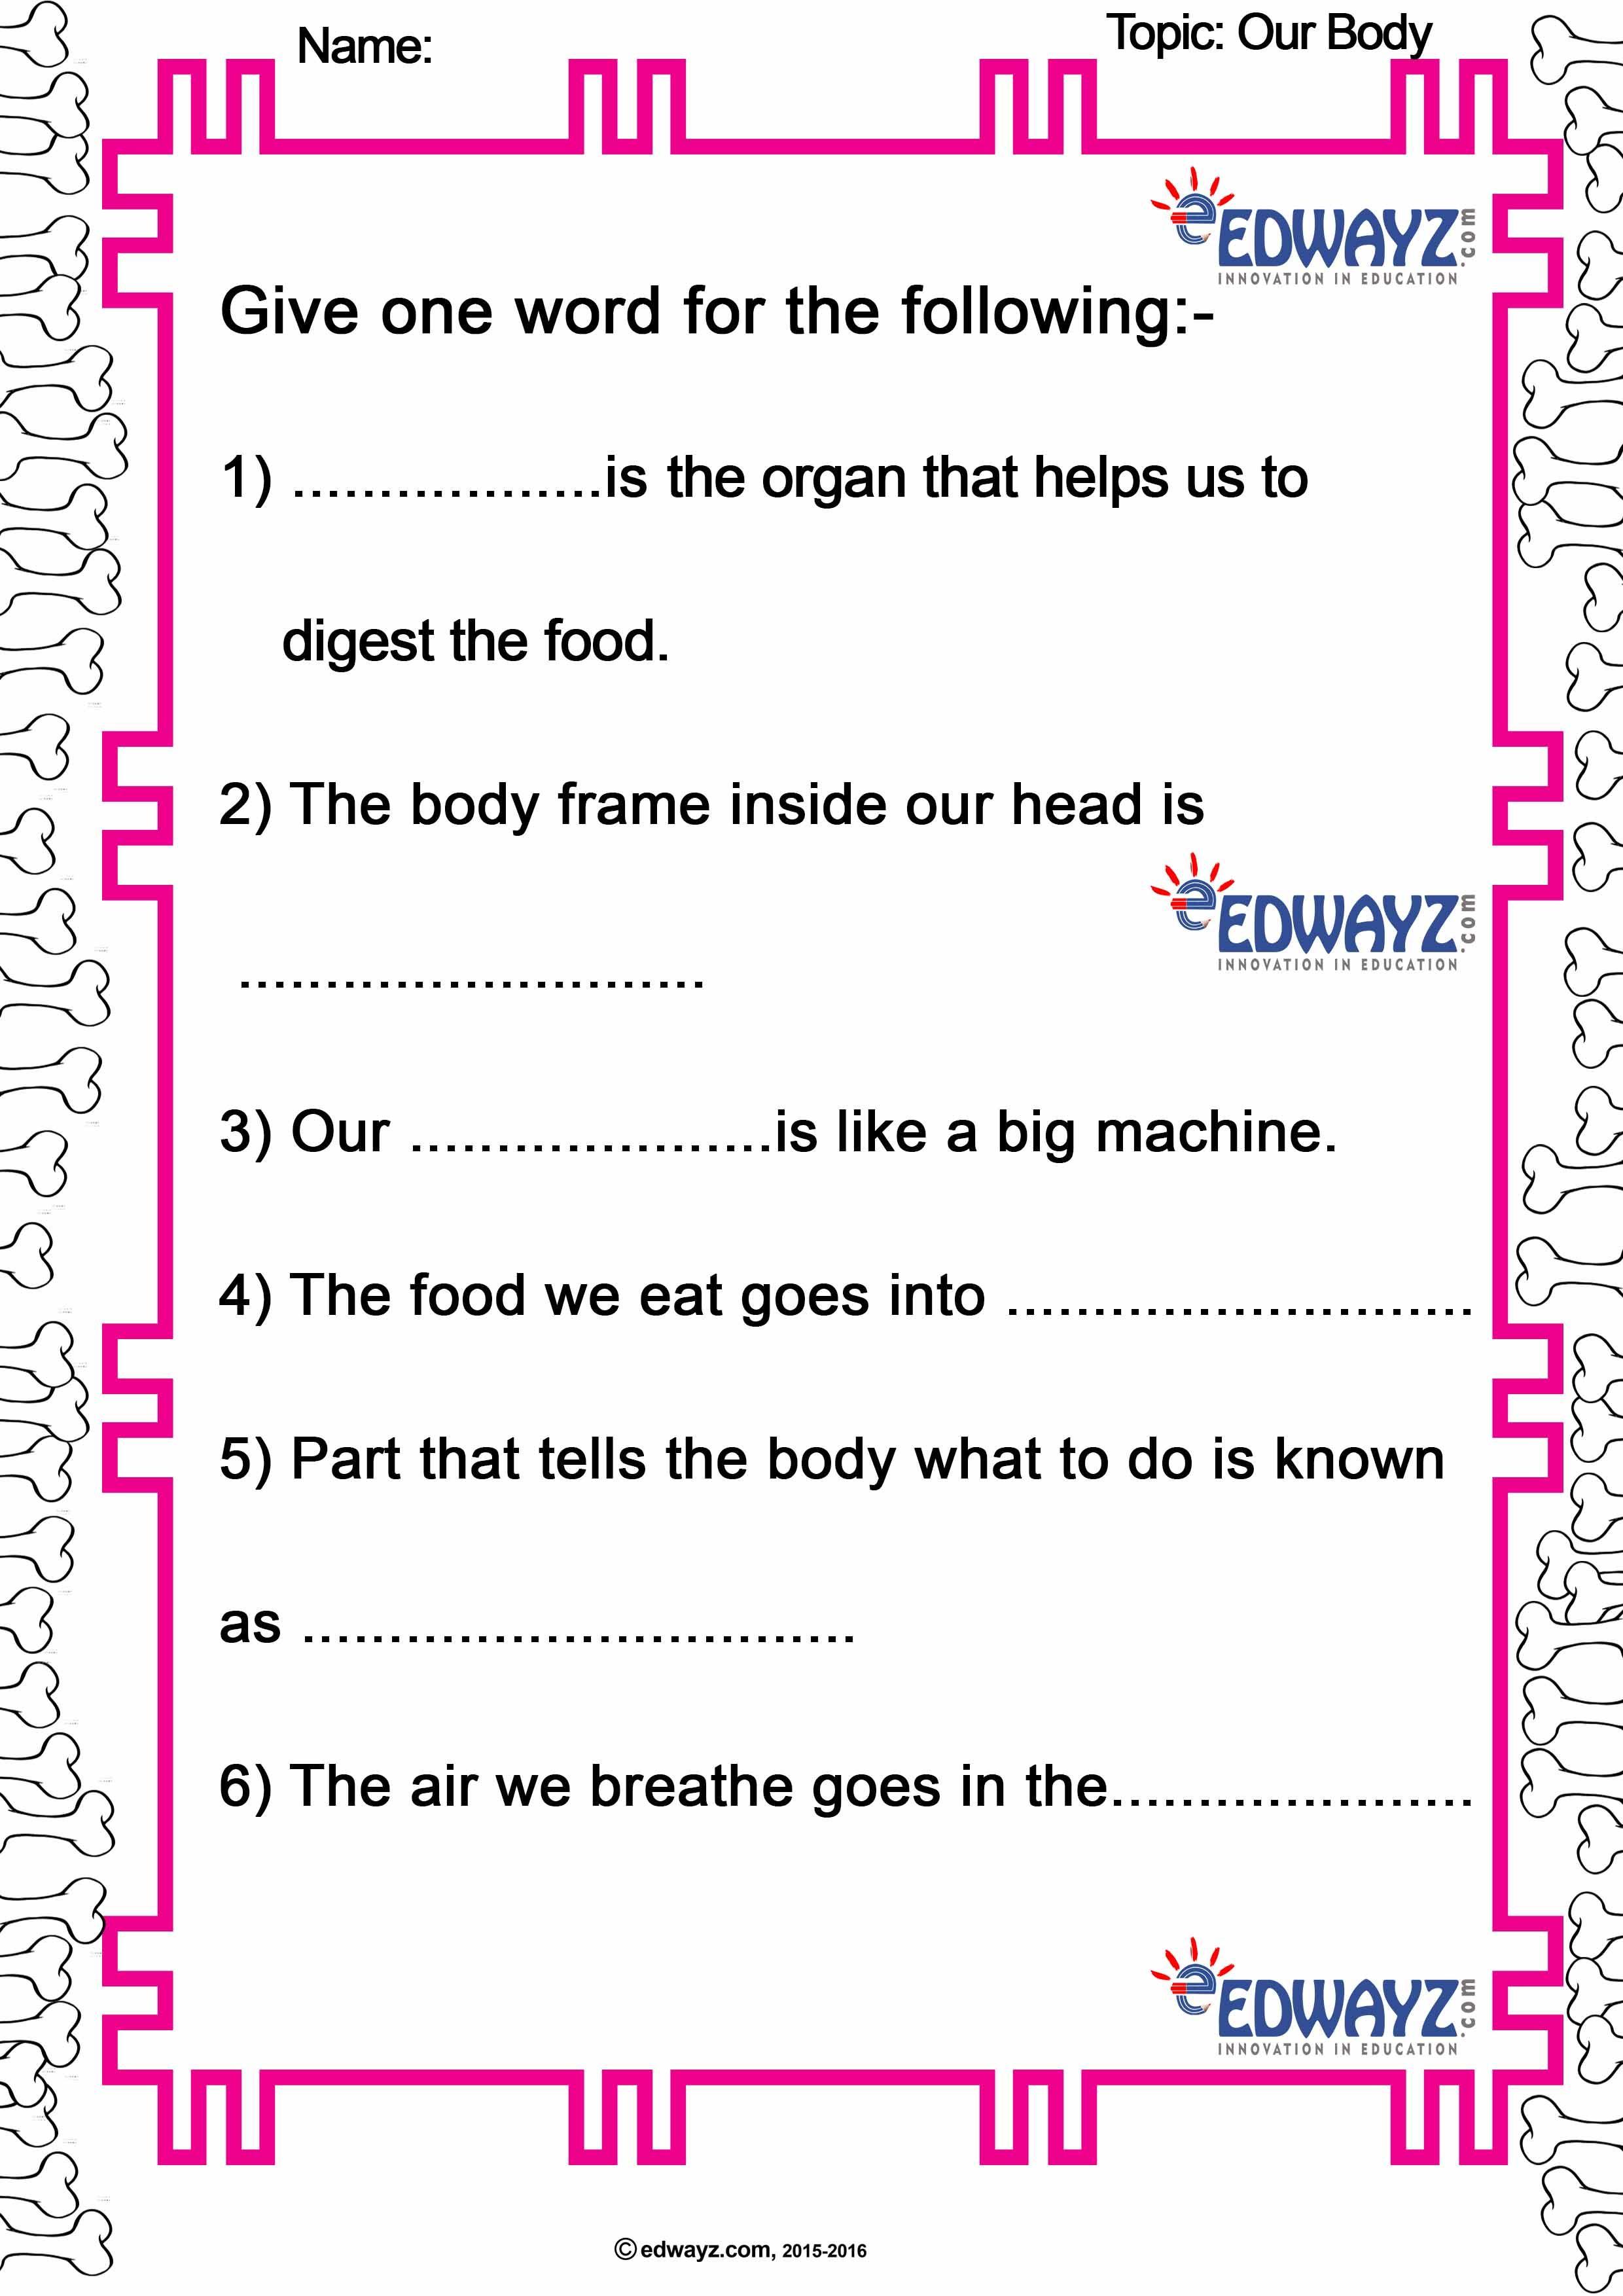 Edwayz_Class2_EVS_Our Body in 2020 | Science kindergarten ...